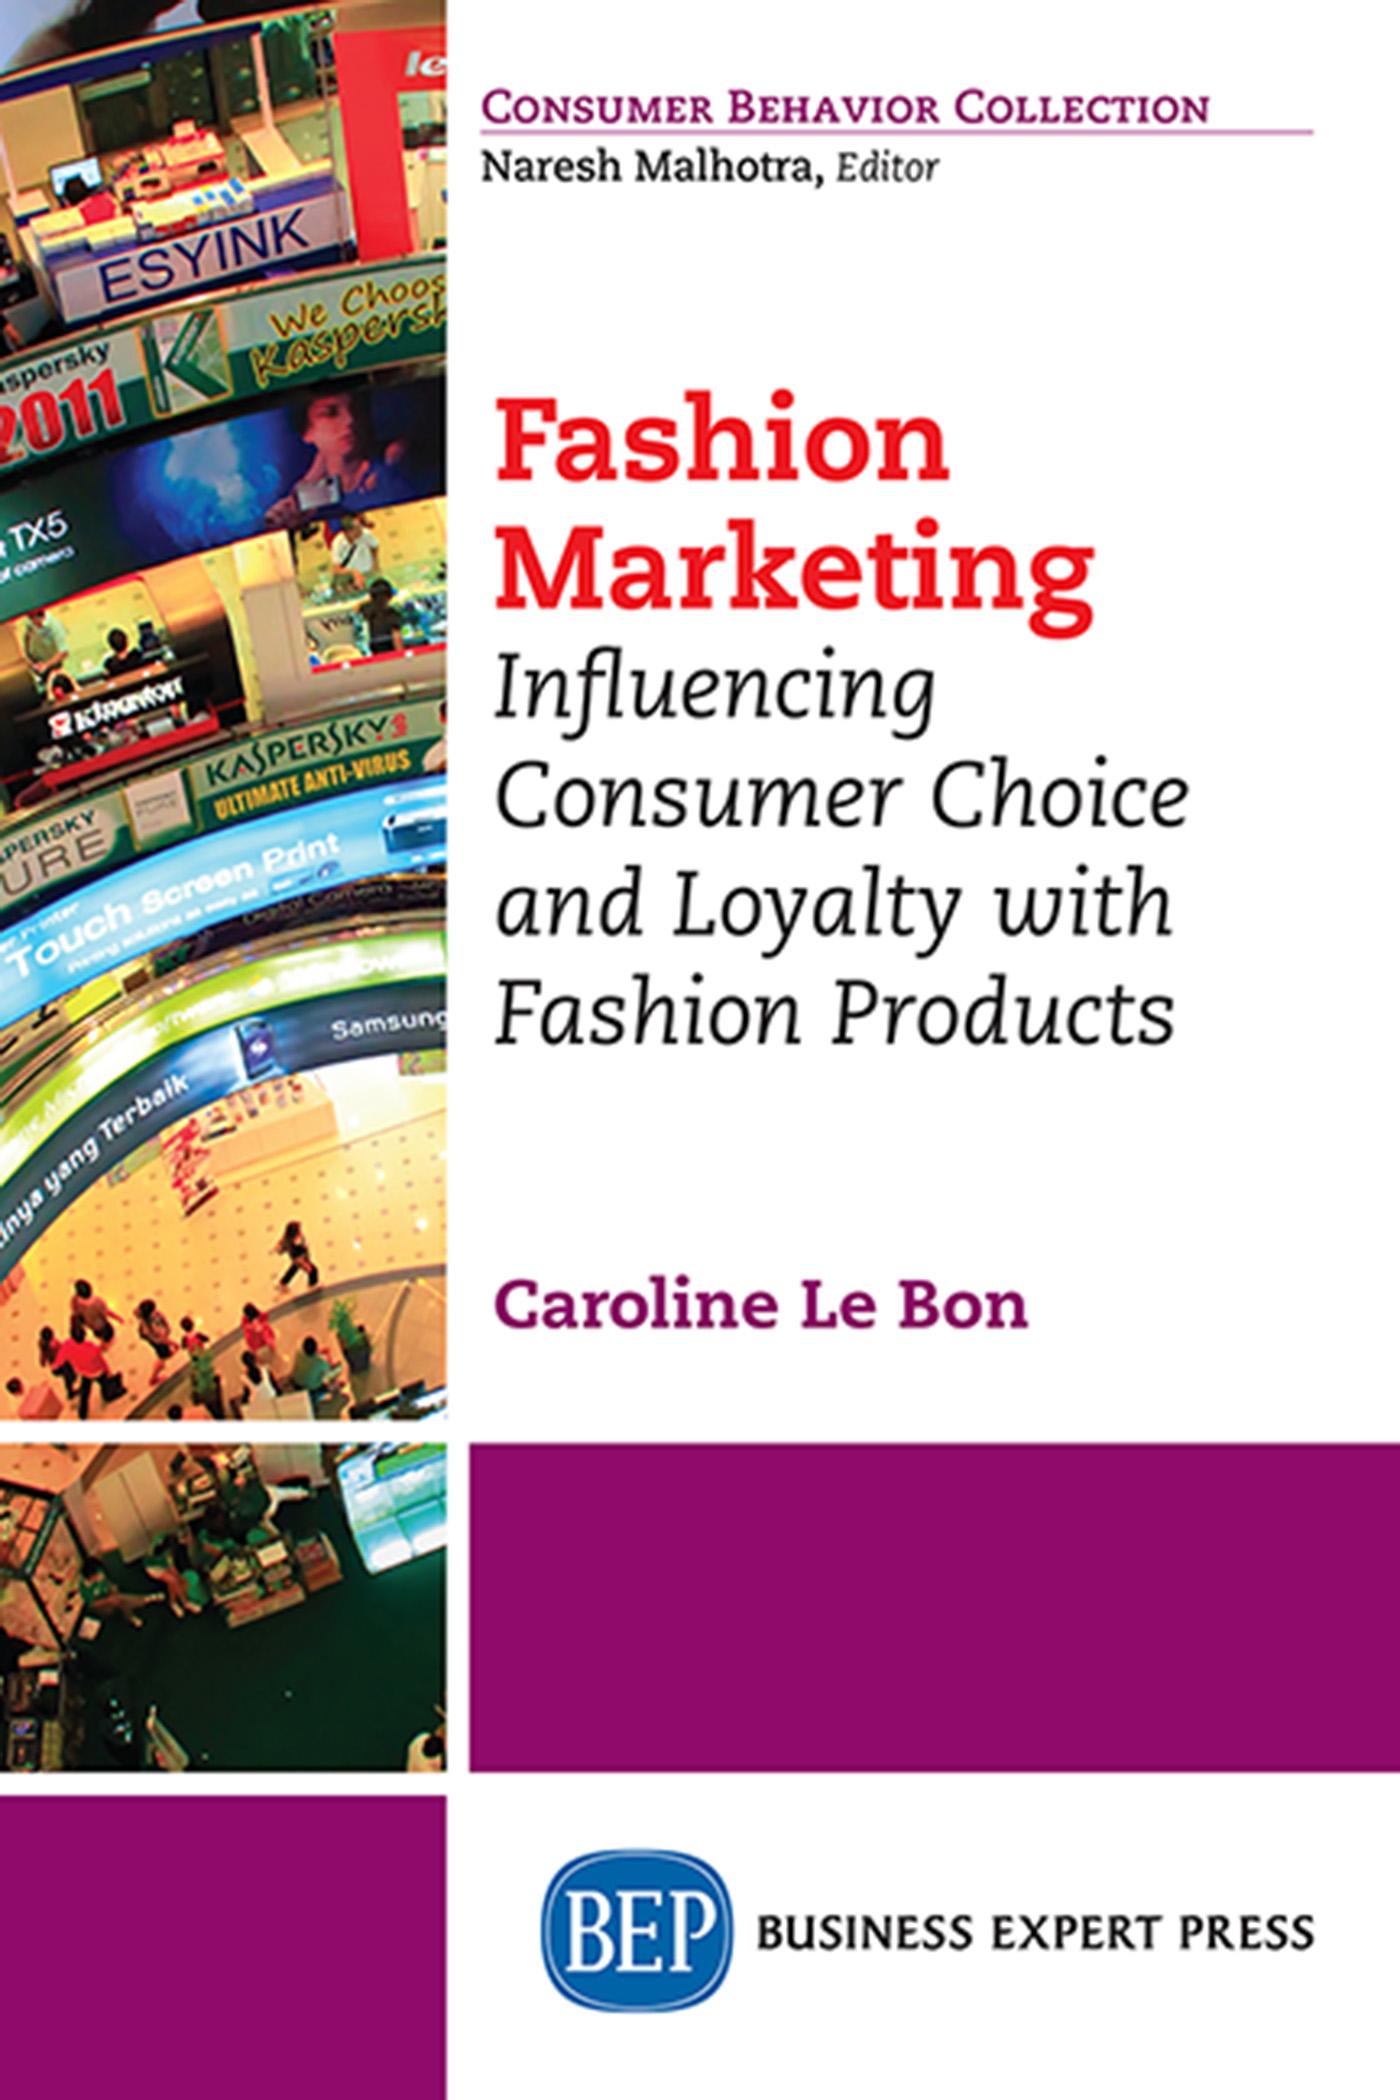 Download Ebook Fashion Marketing by Caroline Le Bon Pdf